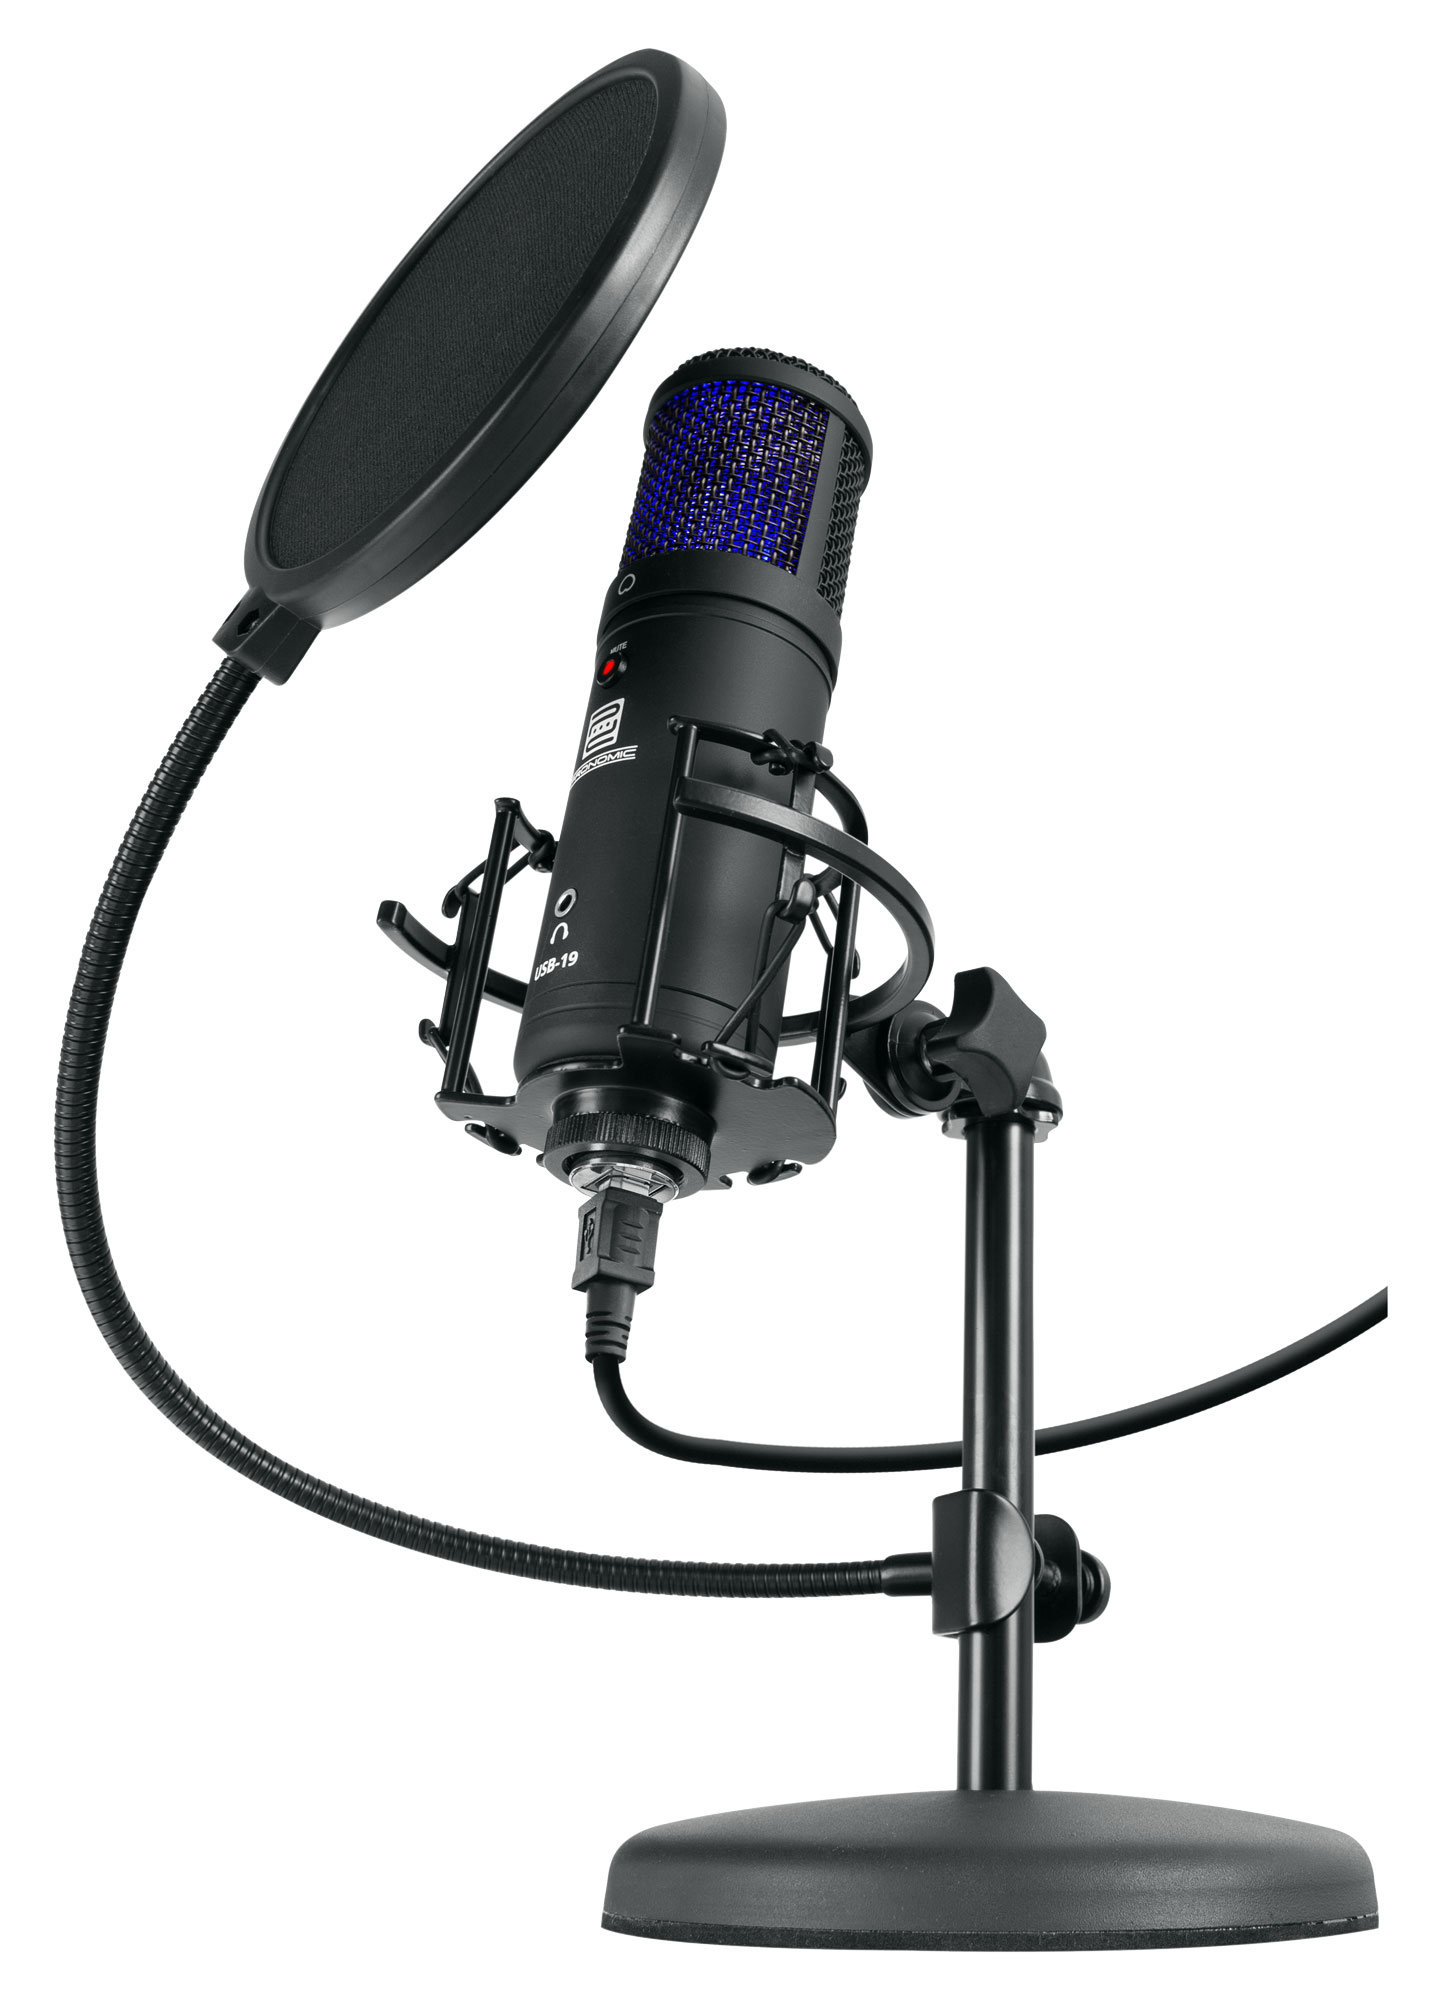 Mikrofone - Pronomic USB 19 Kondensatormikrofon Set - Onlineshop Musikhaus Kirstein